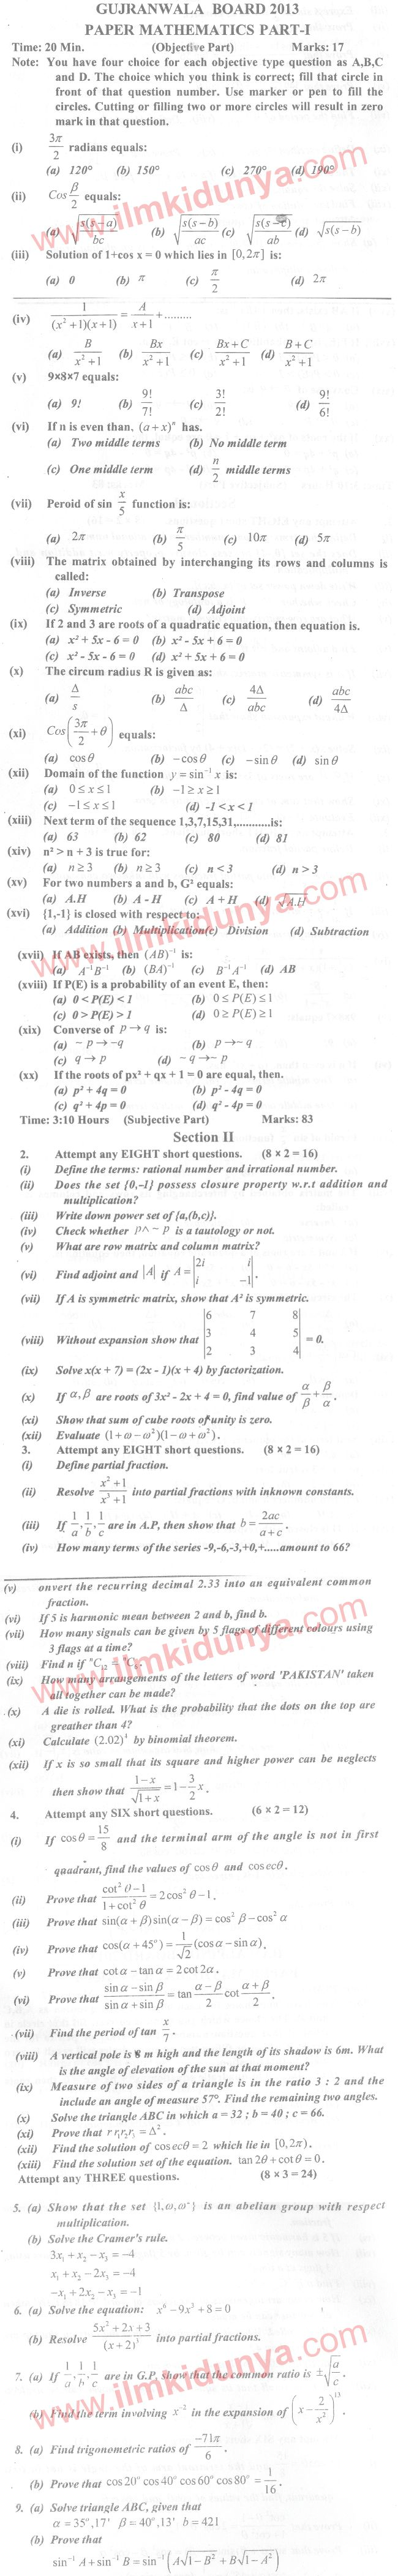 Mathematics 9th Class Past Papers 2013 Dg Khan Board